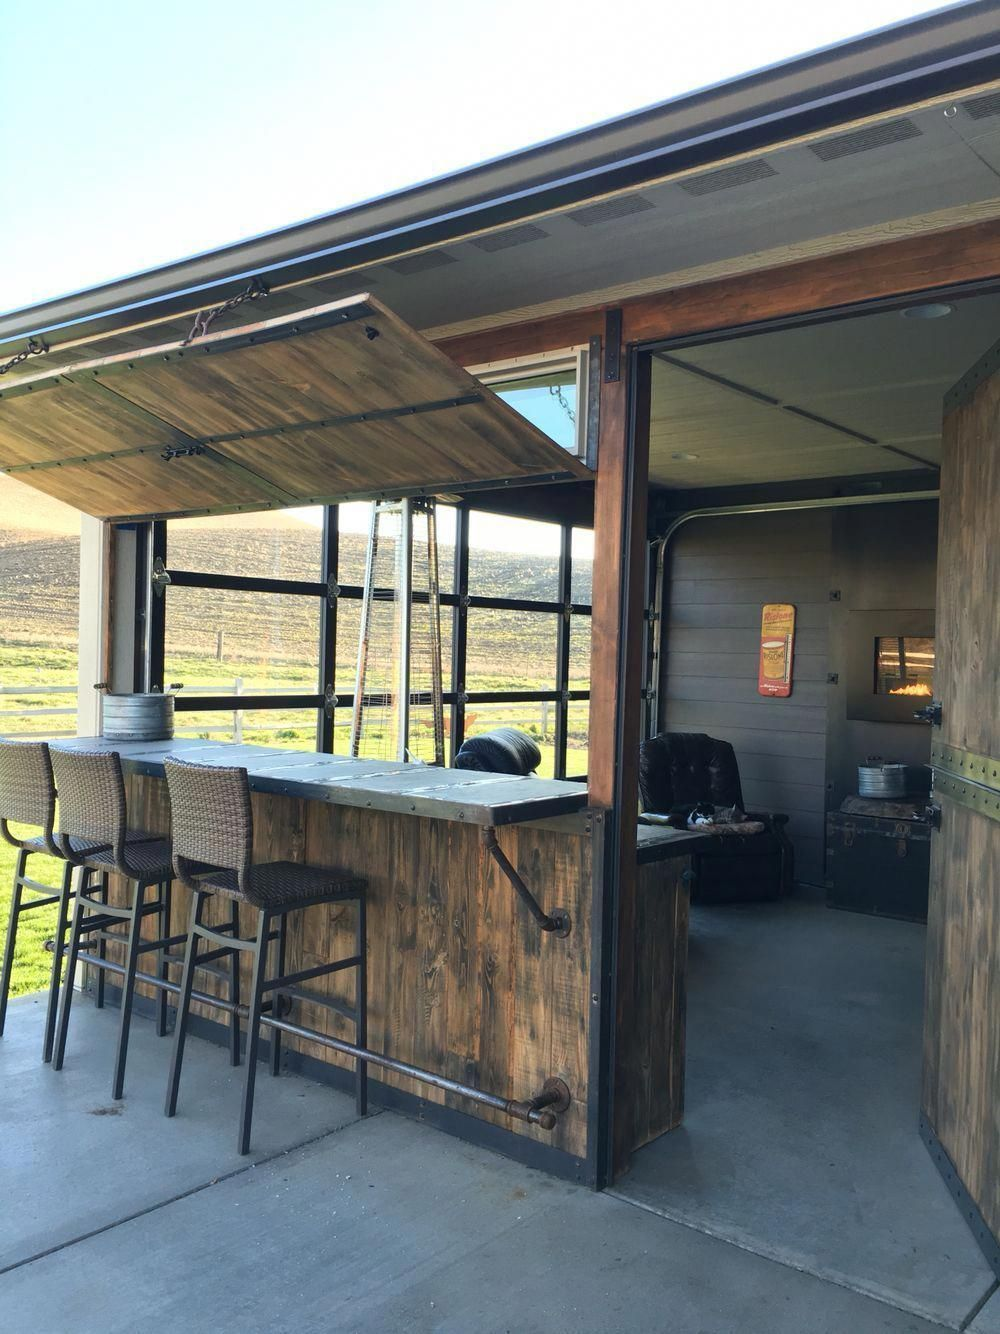 Outdoor Kitchen Ideas - Built In Grill Design Ideas ...